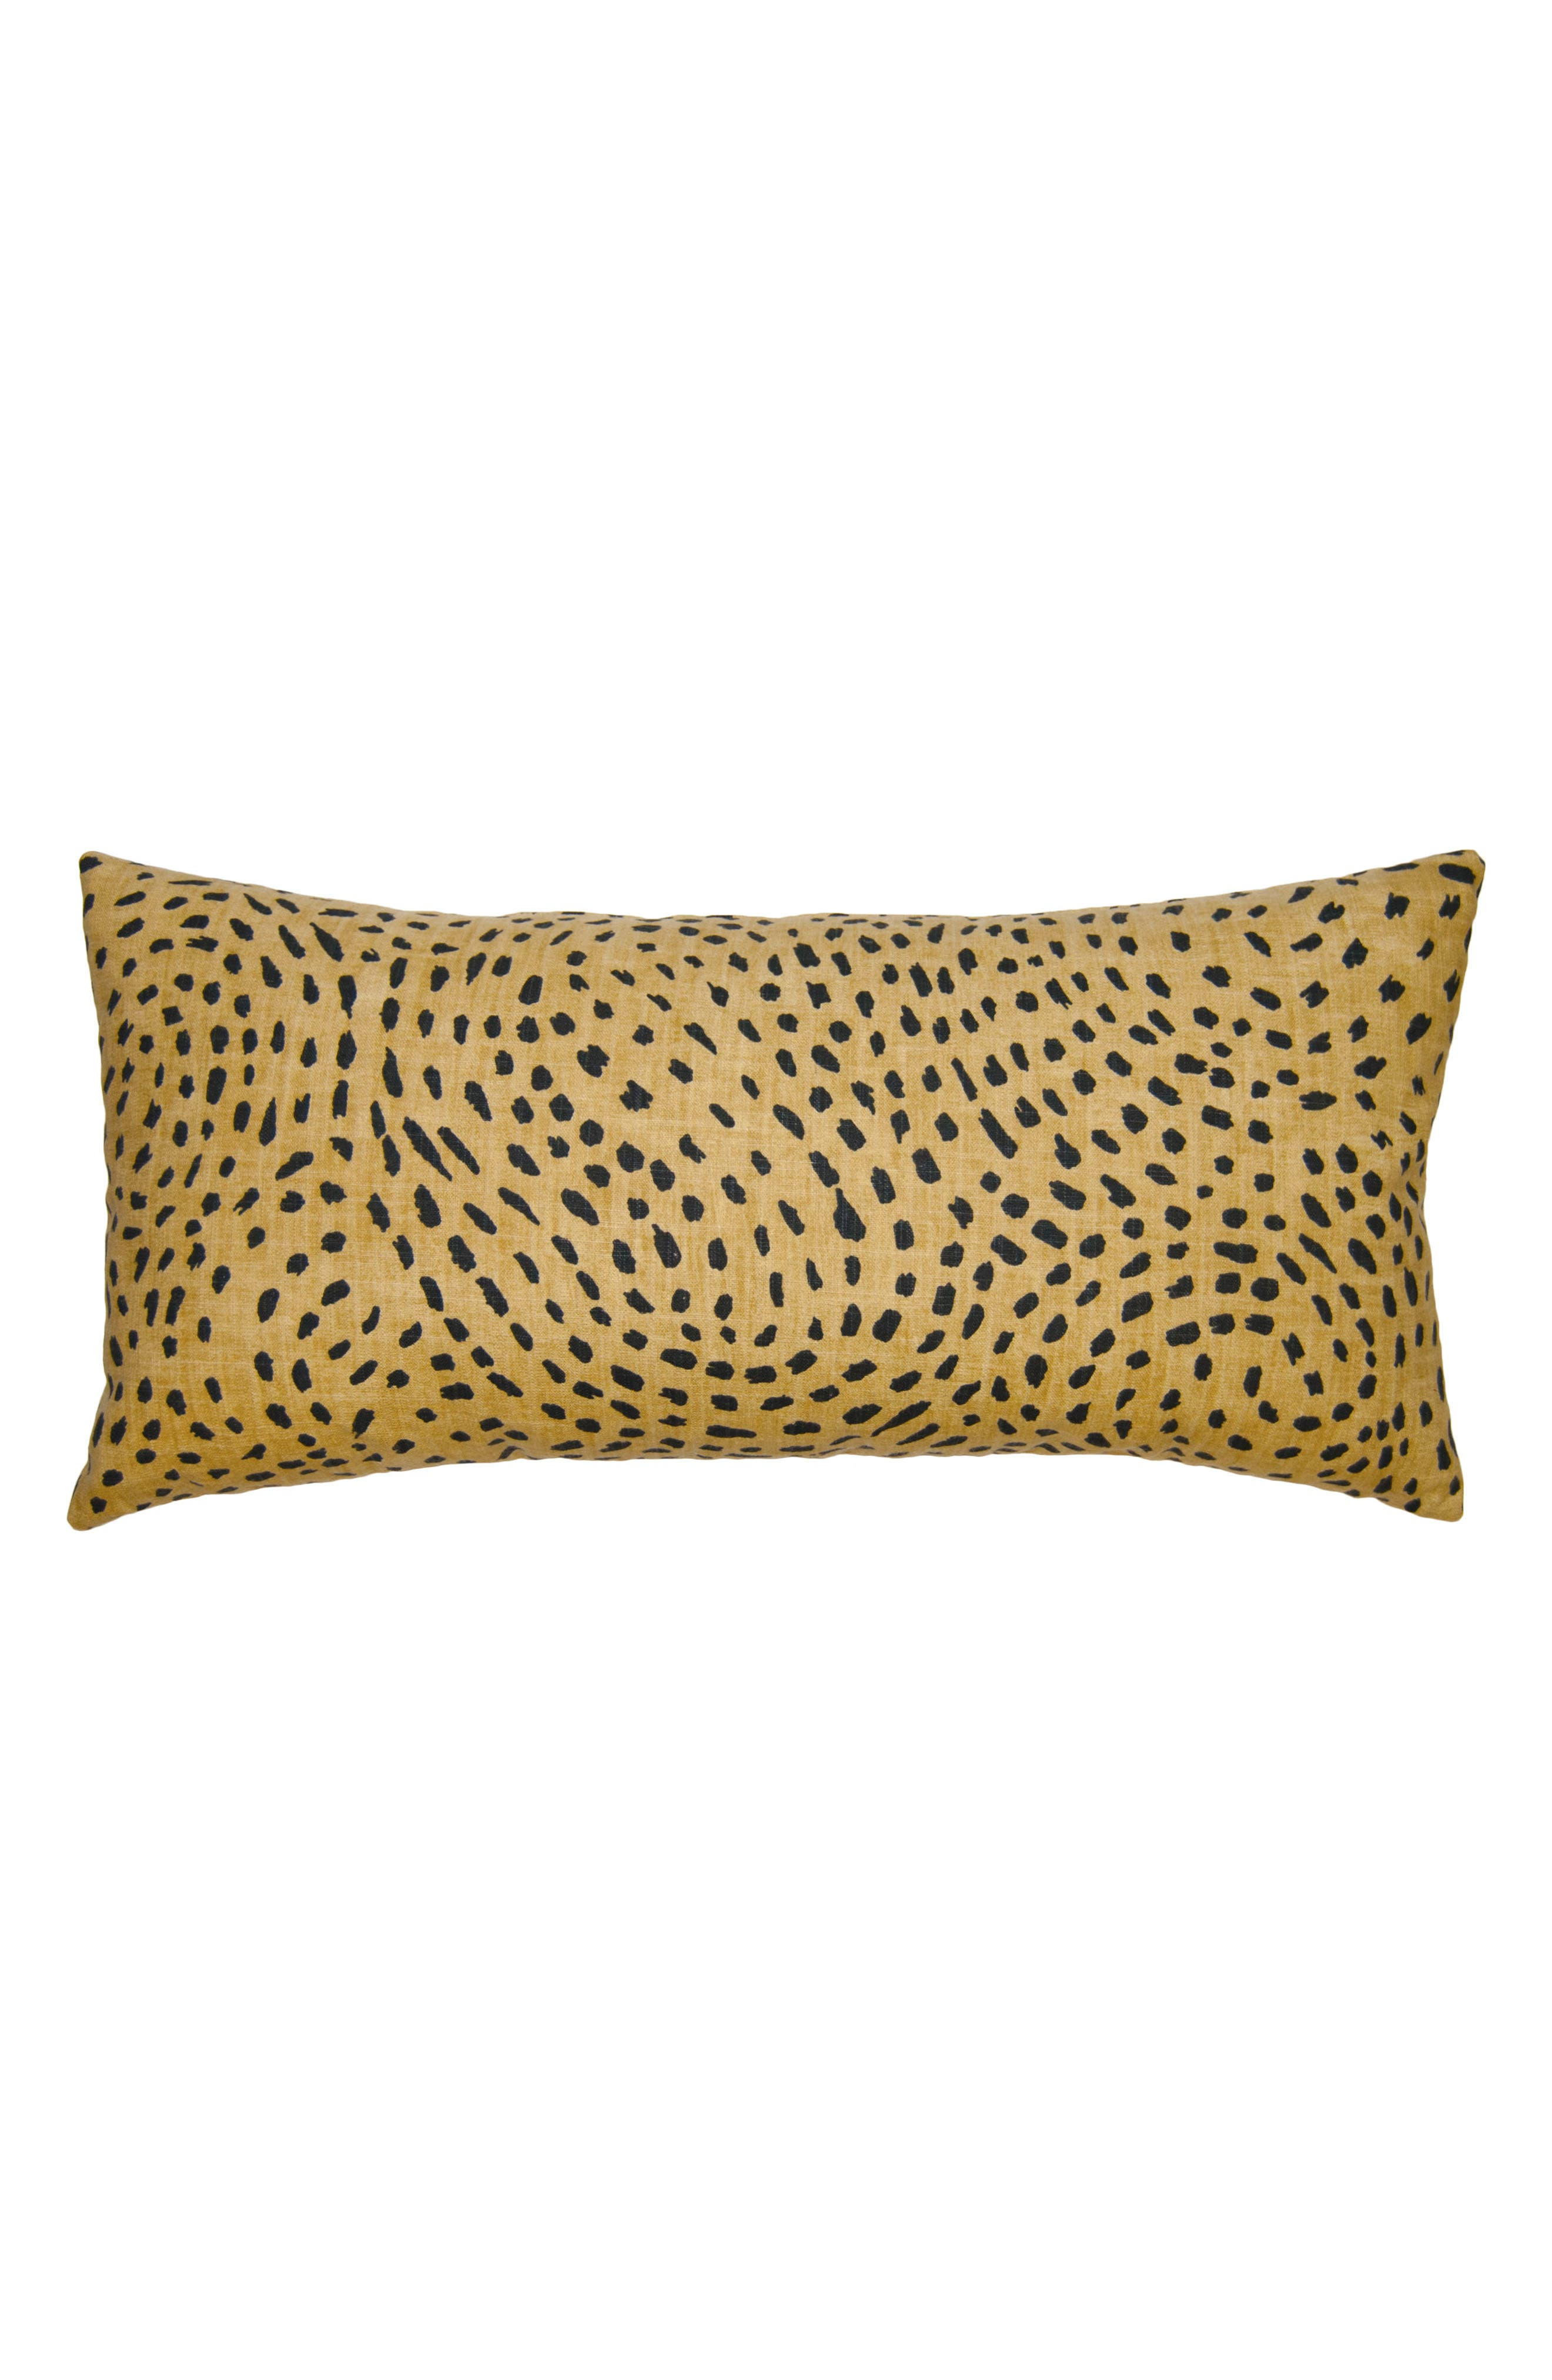 Kingdom Cheetah Accent Pillow,                             Main thumbnail 1, color,                             Tan